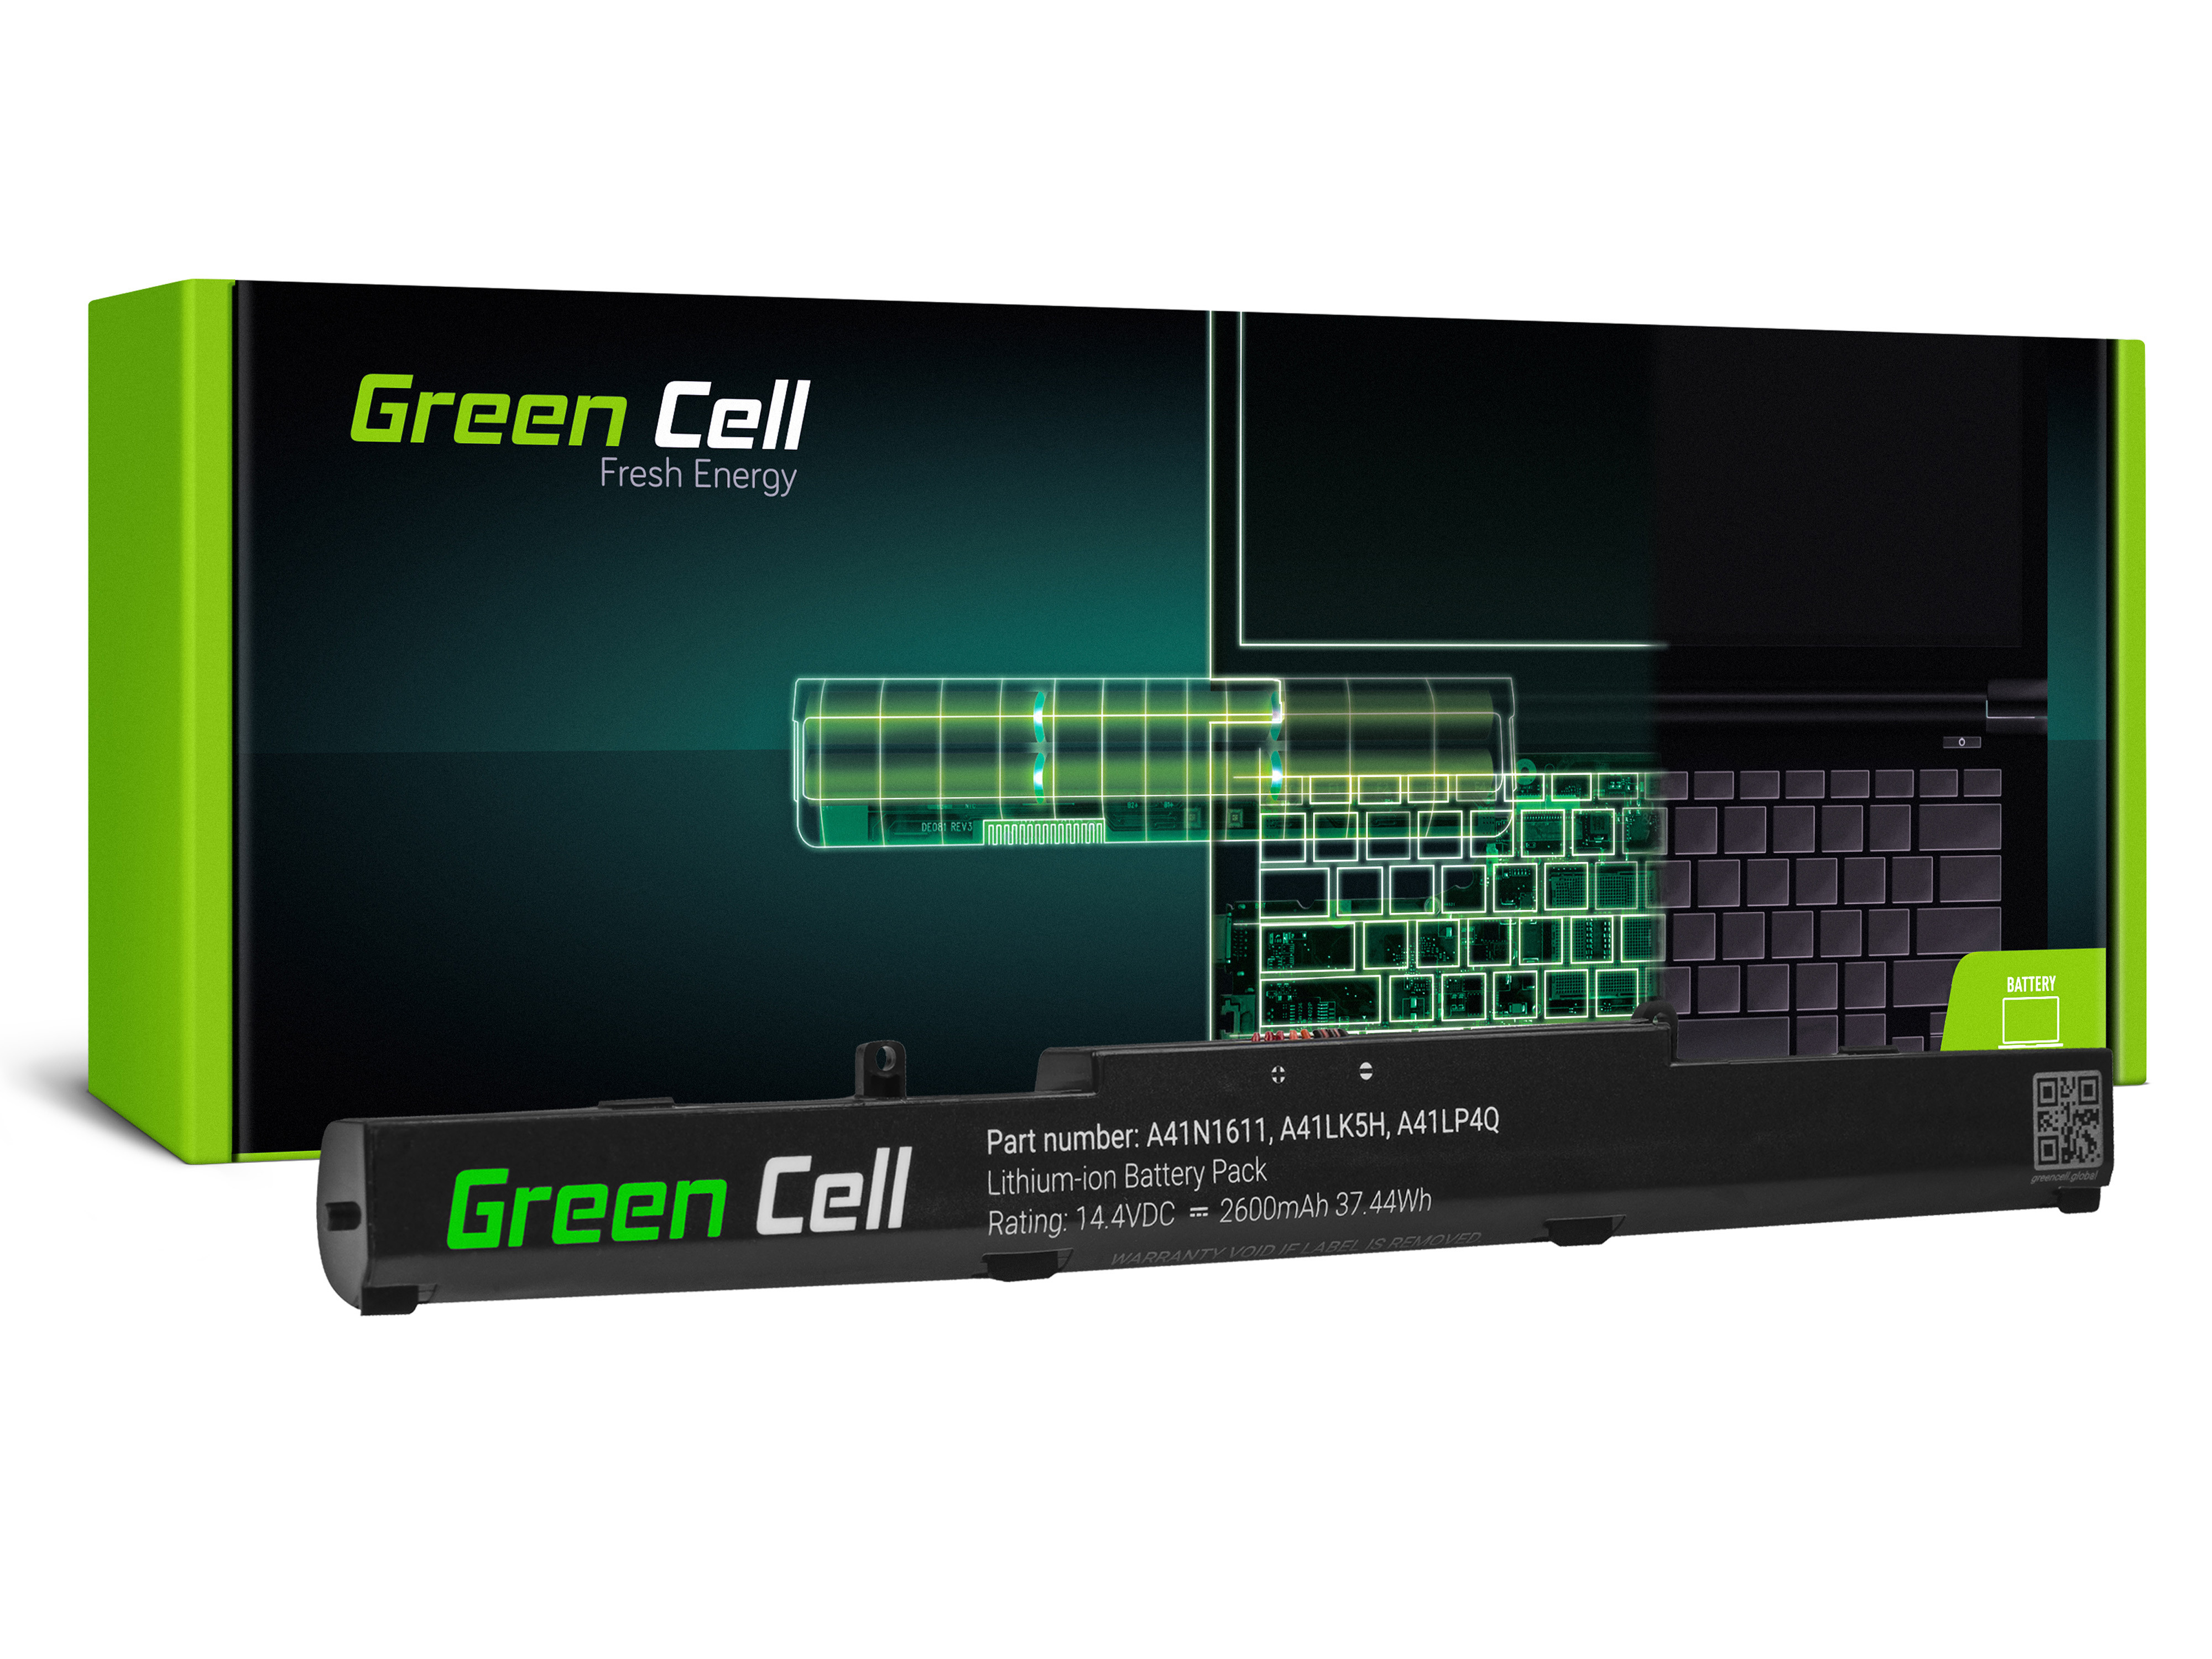 Green Cell AS153 Baterie Asus A41N1611,Asus GL553 GL553V GL553VD GL553VE GL553VW GL753 GL753V GL753VD GL753VE FX553V FX753 FX753V 2600mAh Li-ion - neoriginální